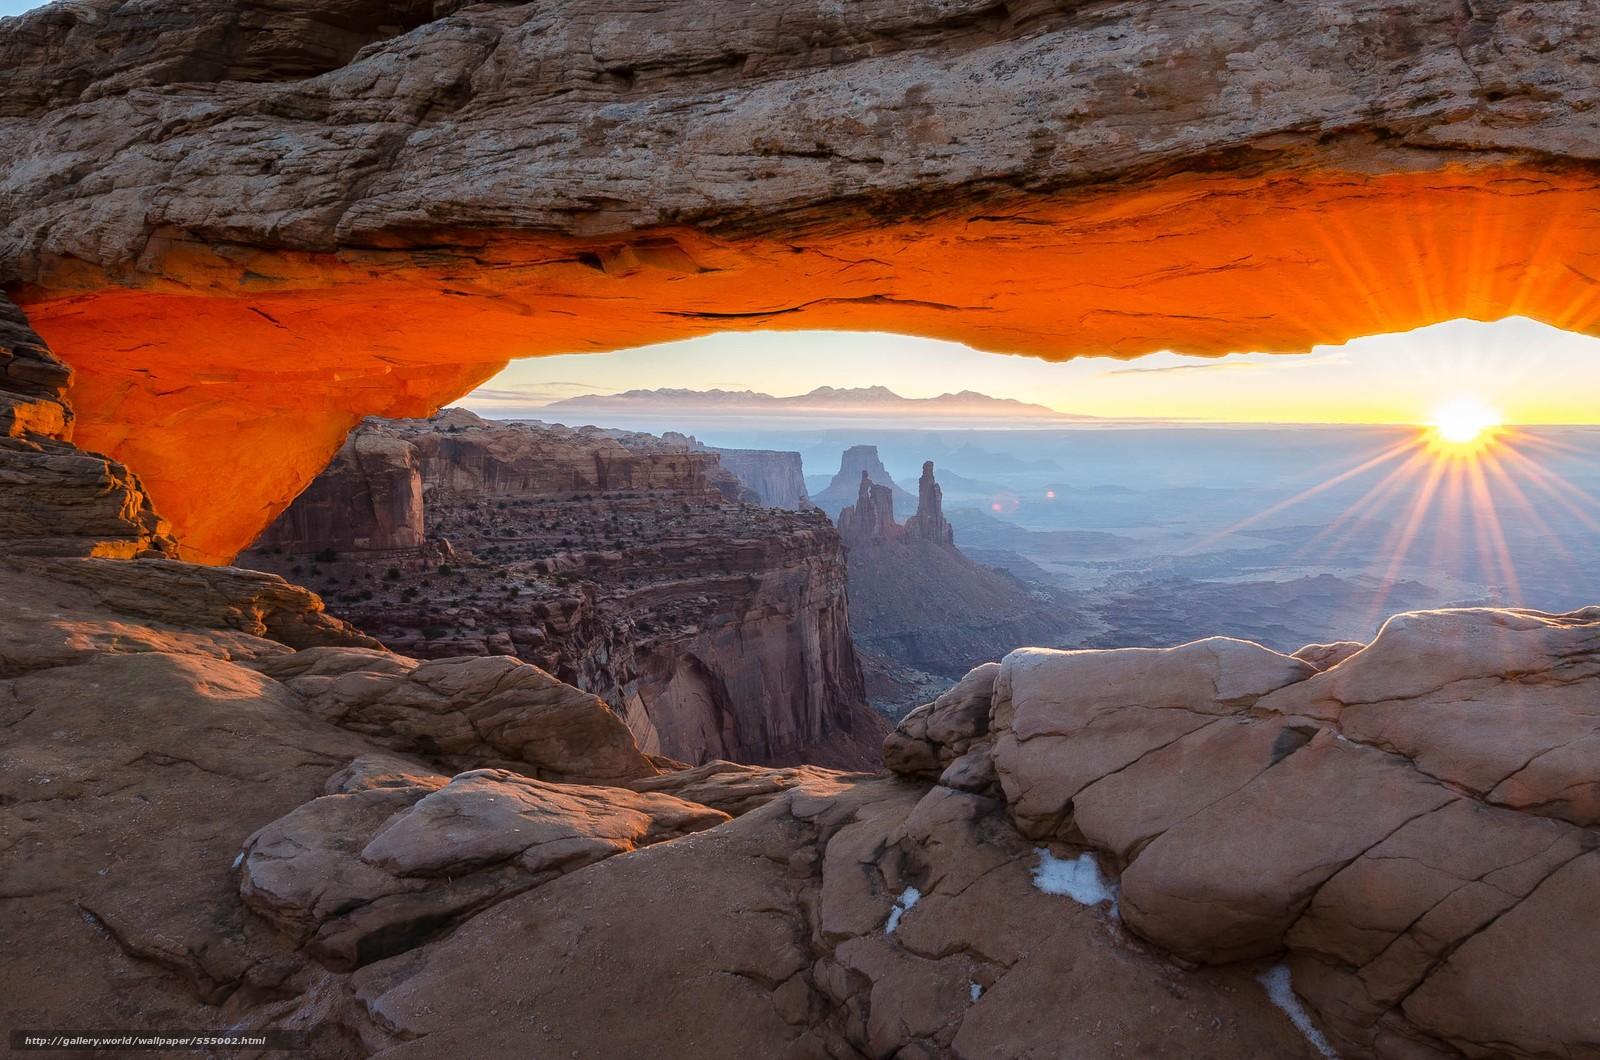 Download wallpaper Canyonlands National Park Mountains Rocks sunset 1600x1060